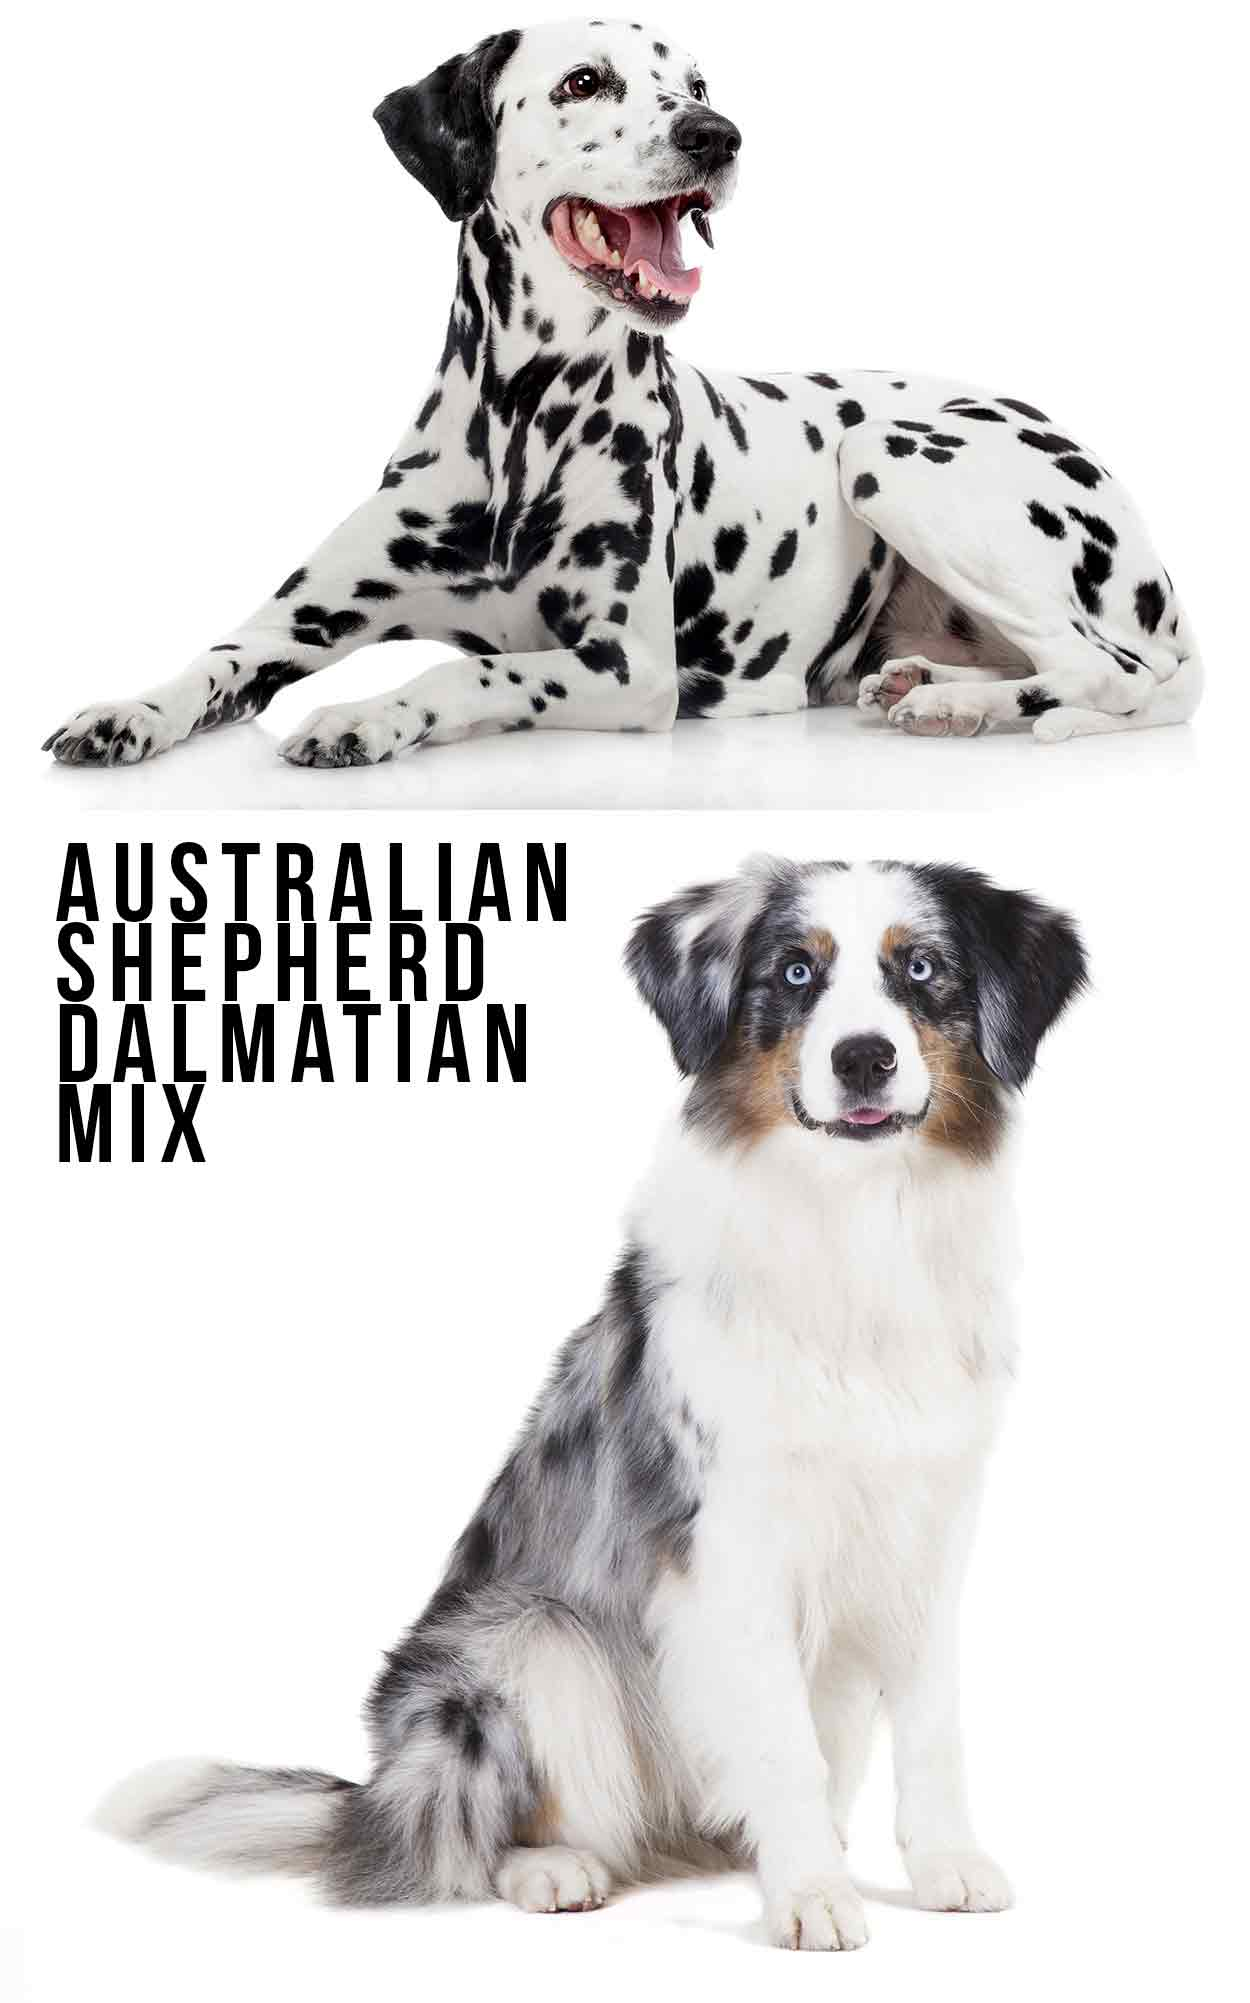 Australian Shepherd Dalmatian Mix - Is This Your Dream Dog?